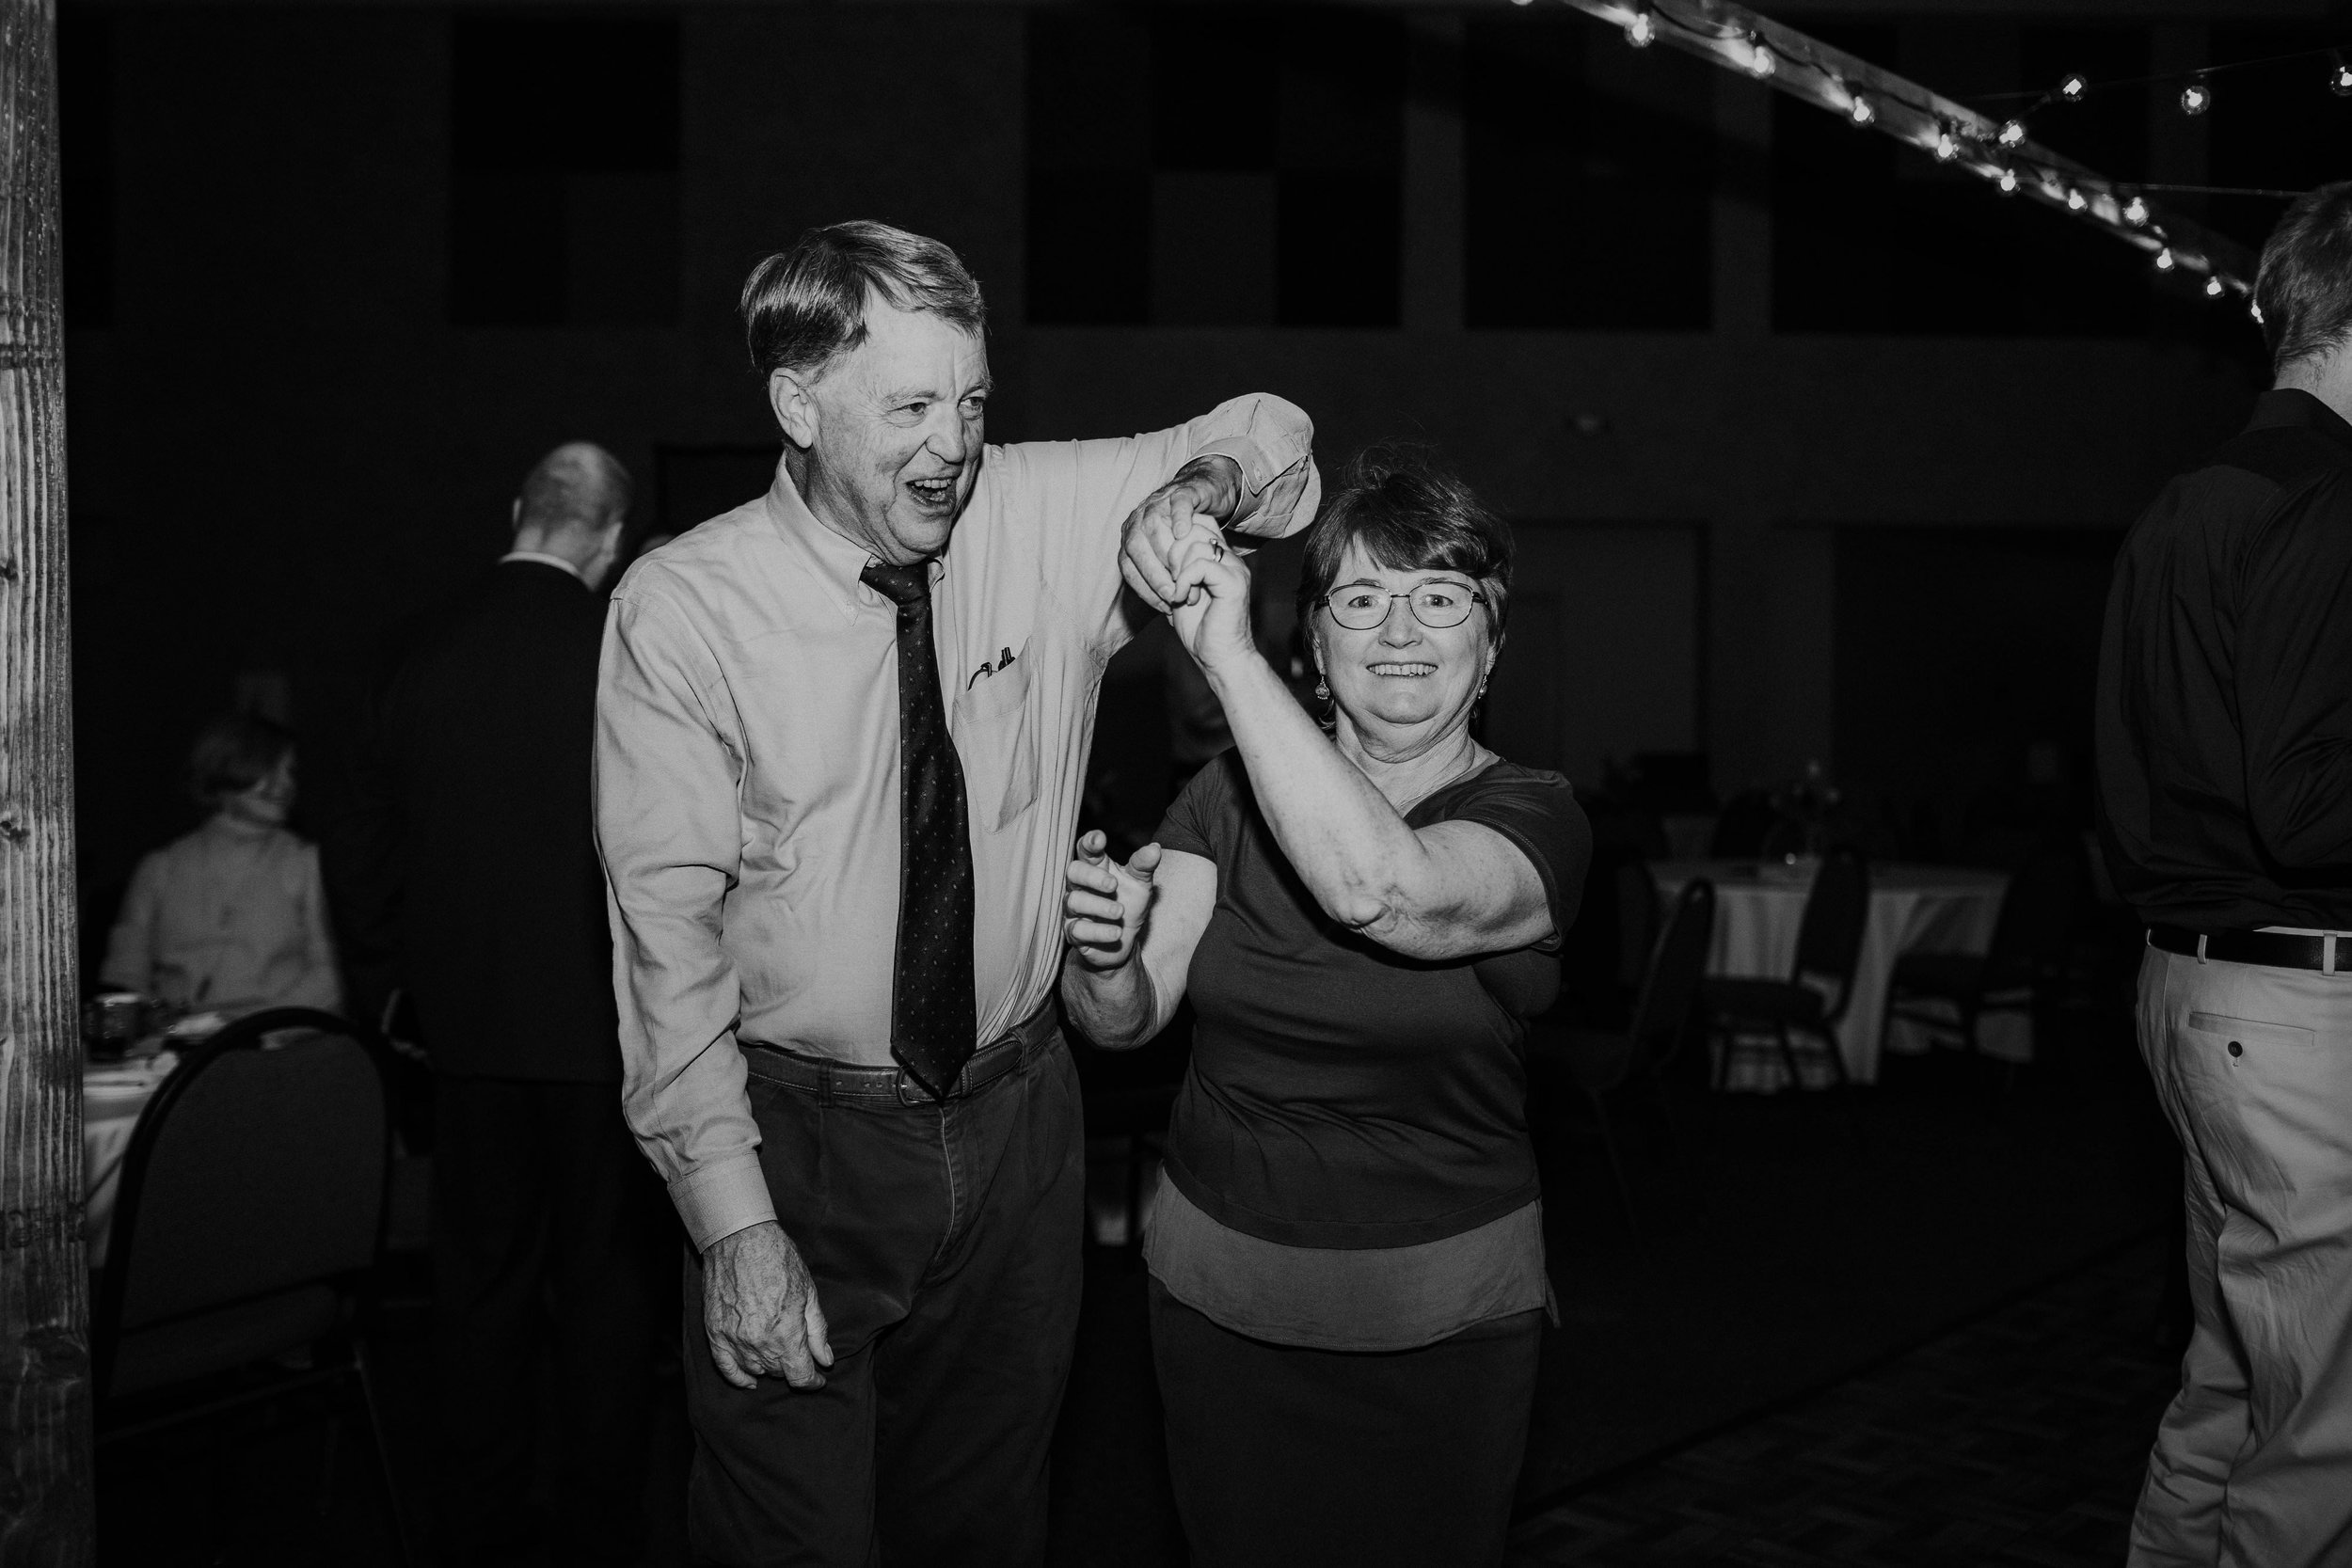 Columbus ohio wedding photographer grace e jones photography real fun joyful wedding182.jpg